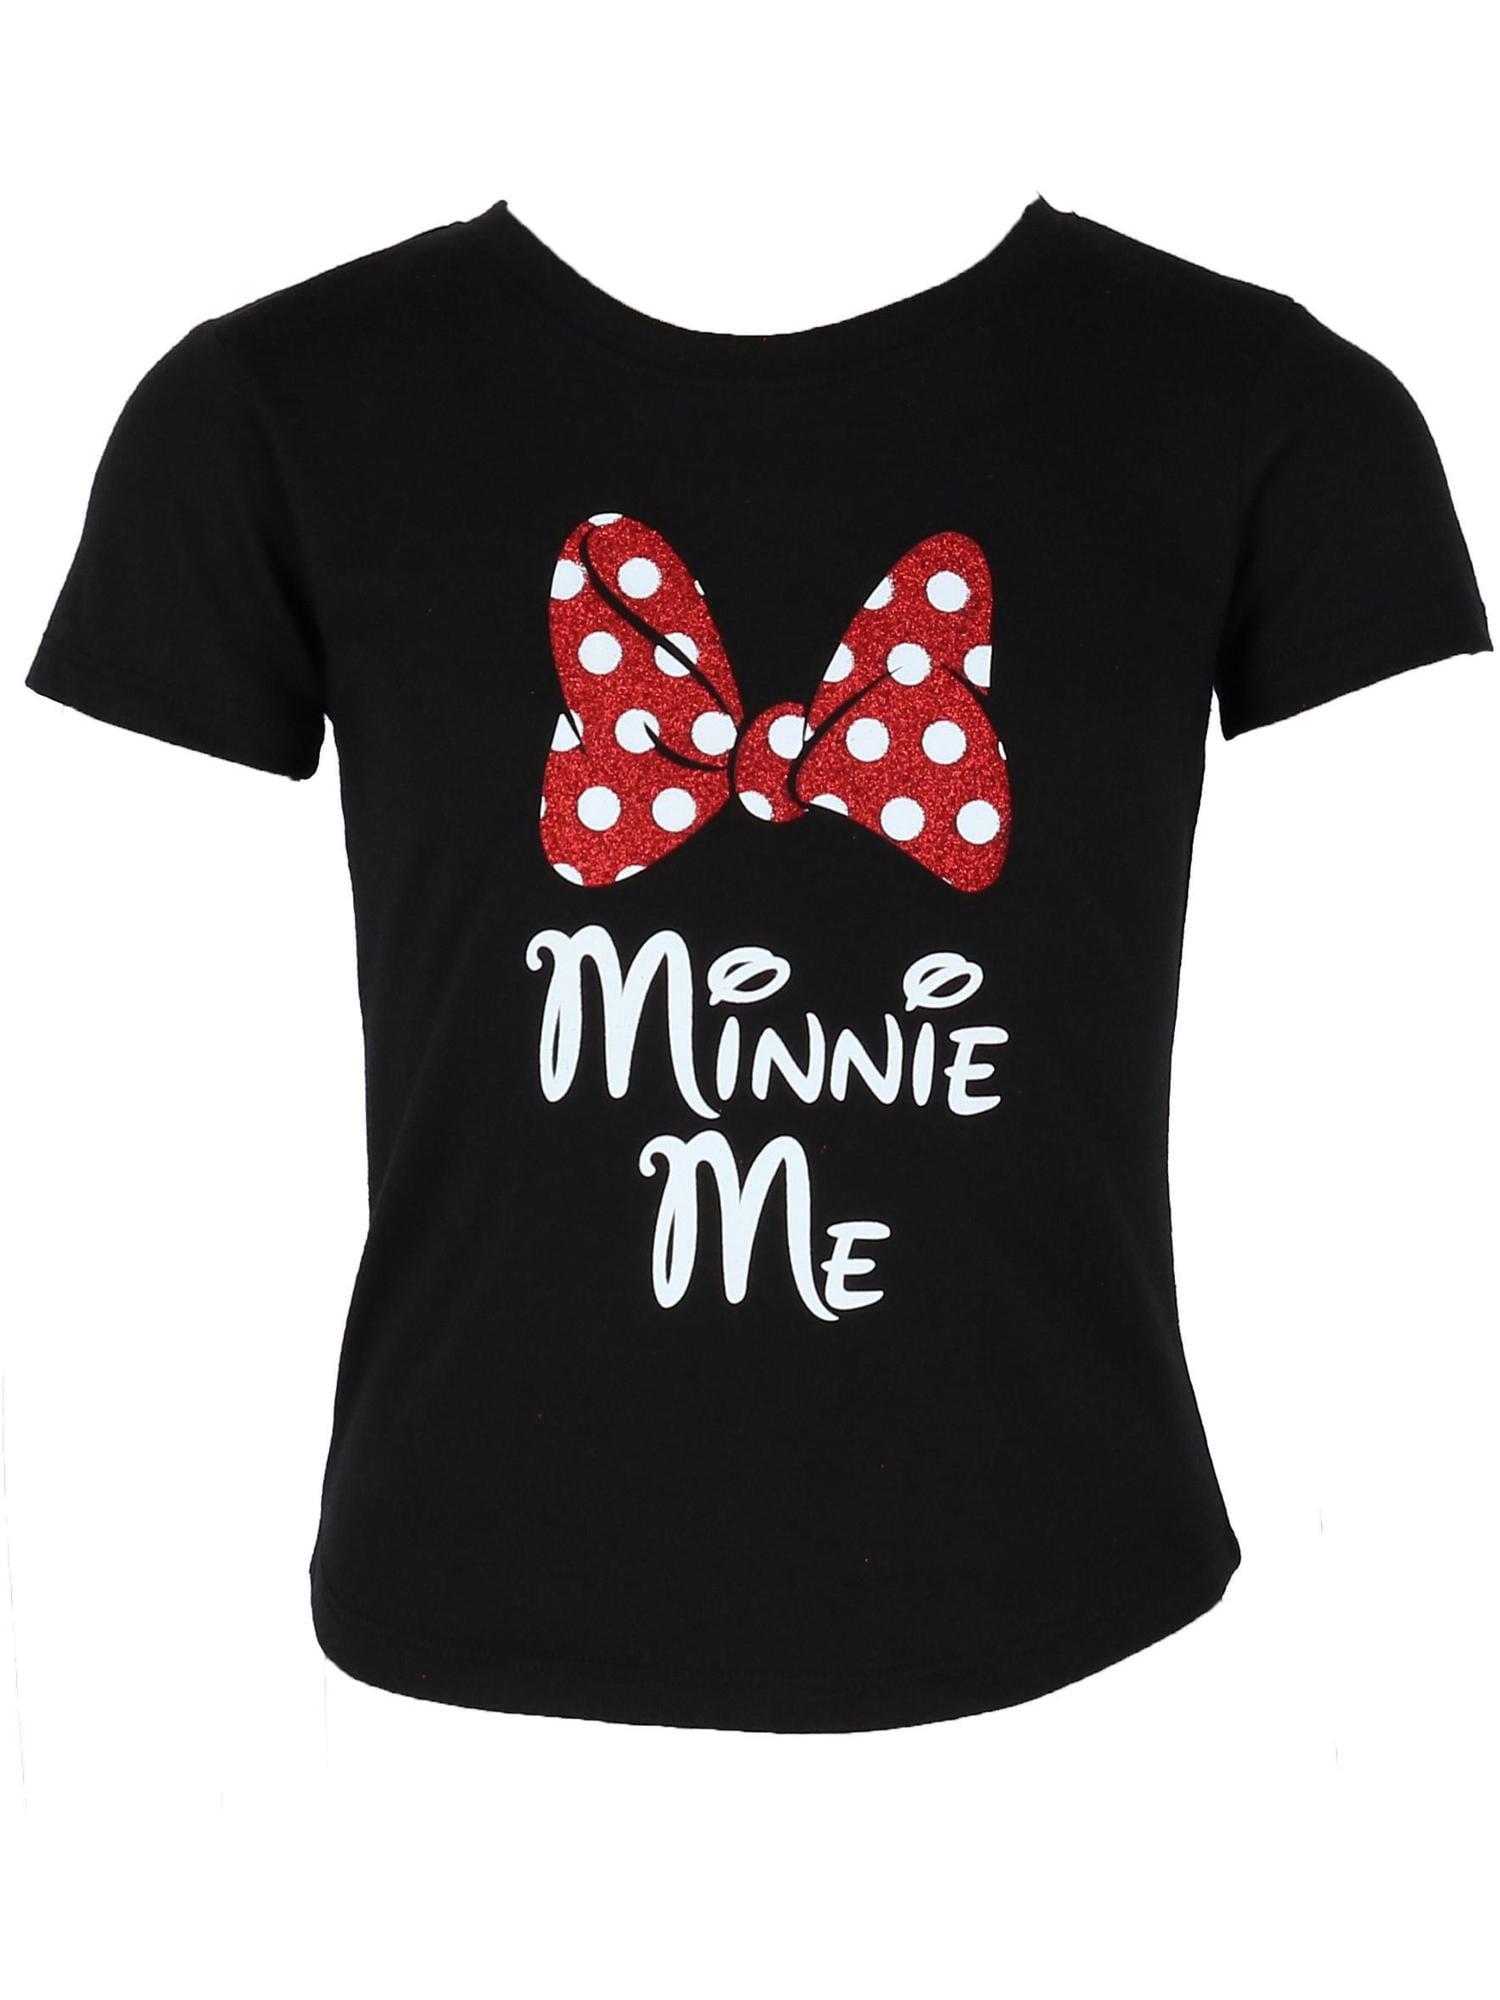 Girls Minnie Mouse Glitter Bow Tee Shirt,  Black